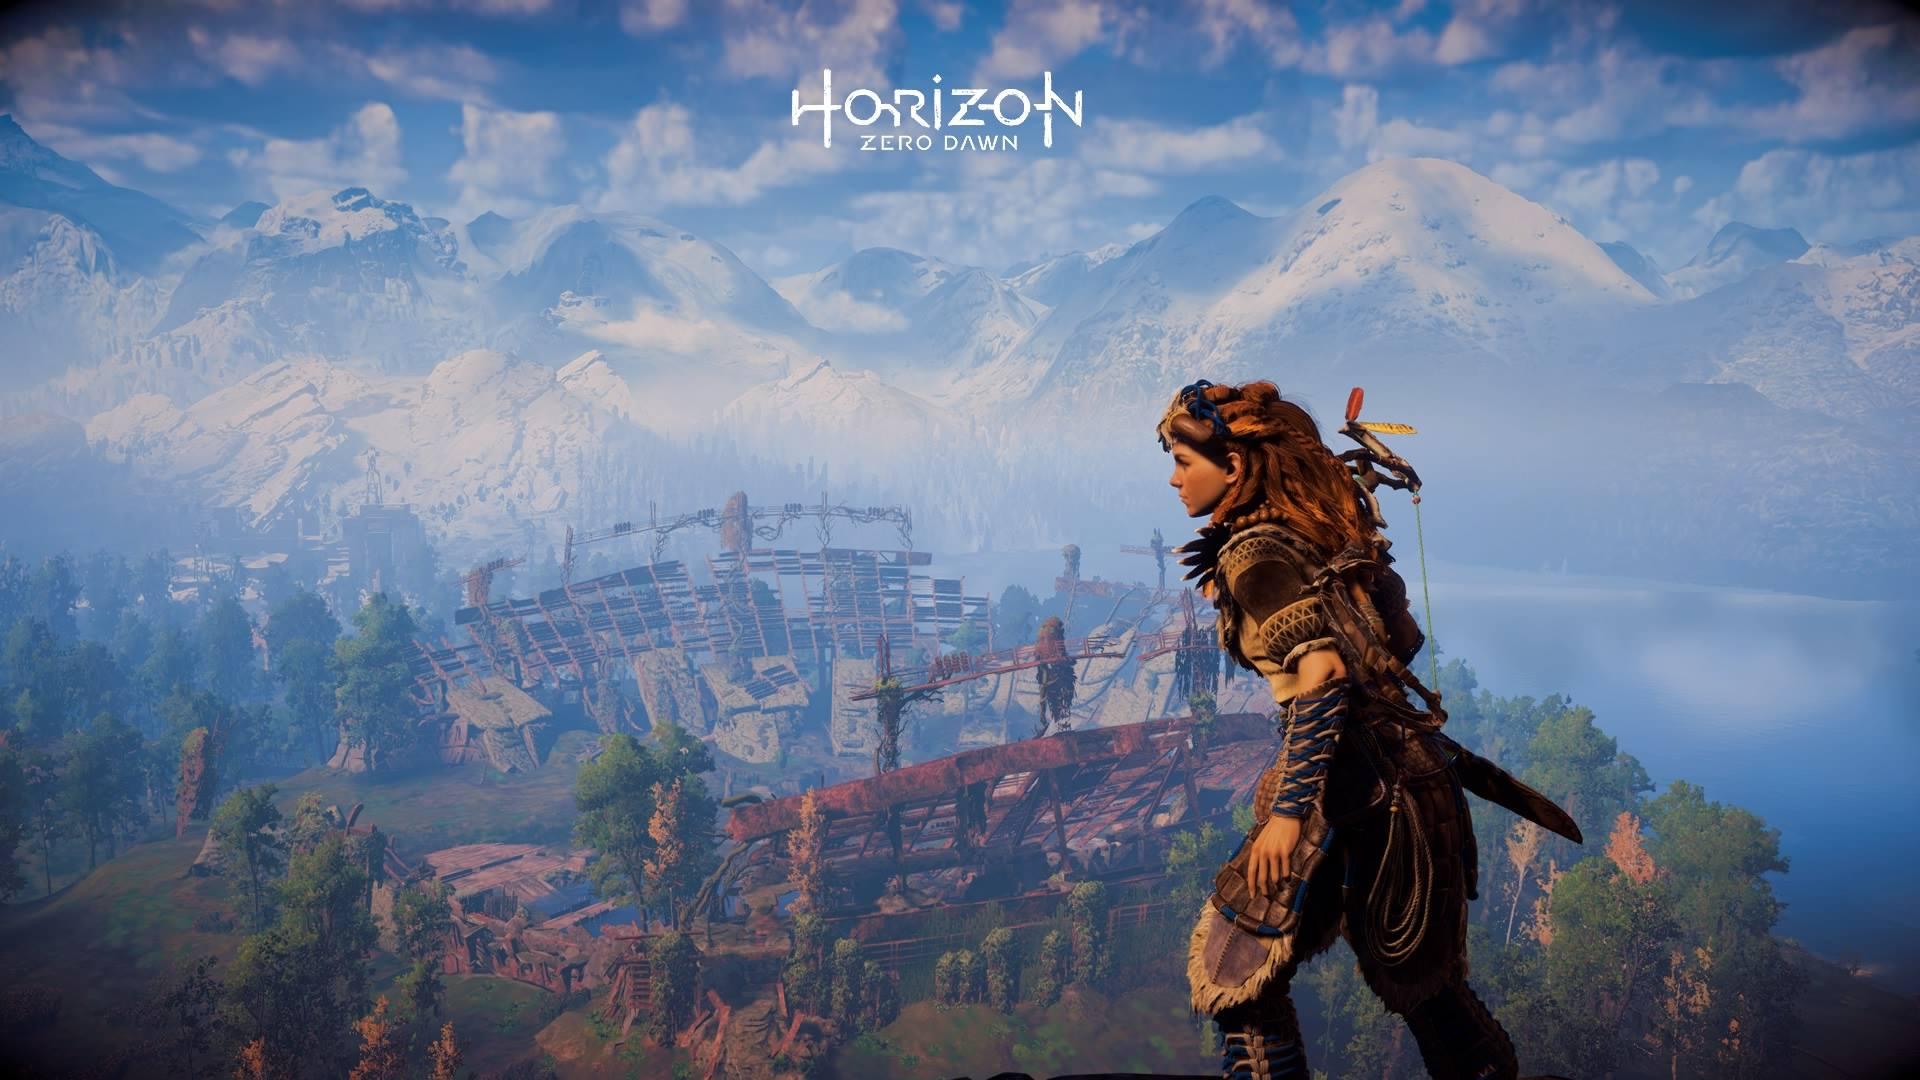 Horizon Zero Dawn Wallpapers Top Free Horizon Zero Dawn